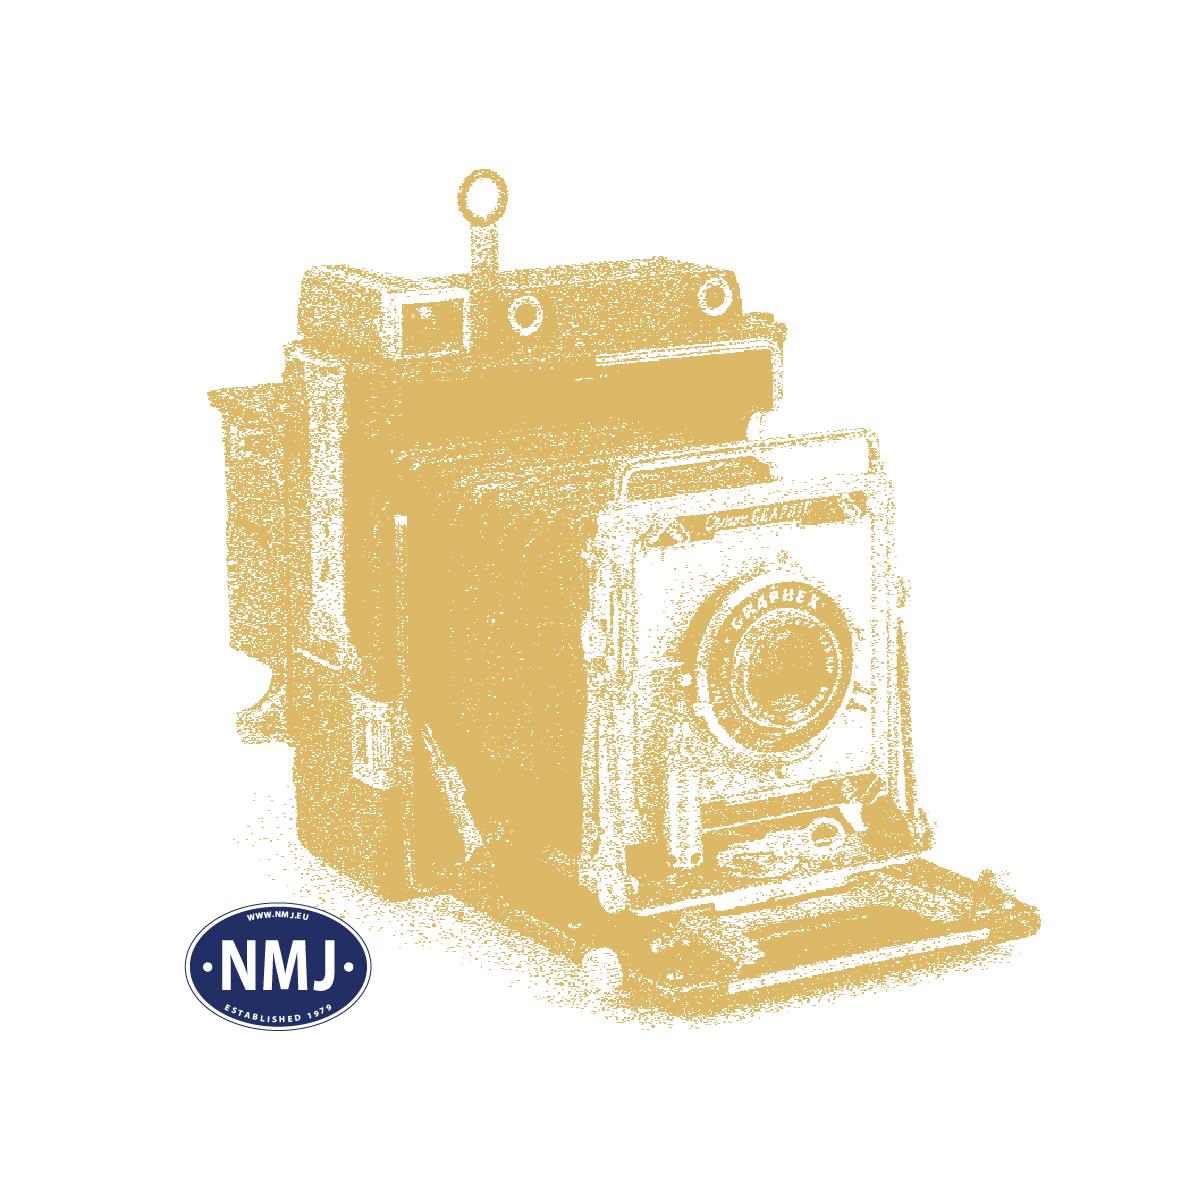 NMJT86.200AC - NMJ Topline NSB El11.2093, Redbrown, AC Digital